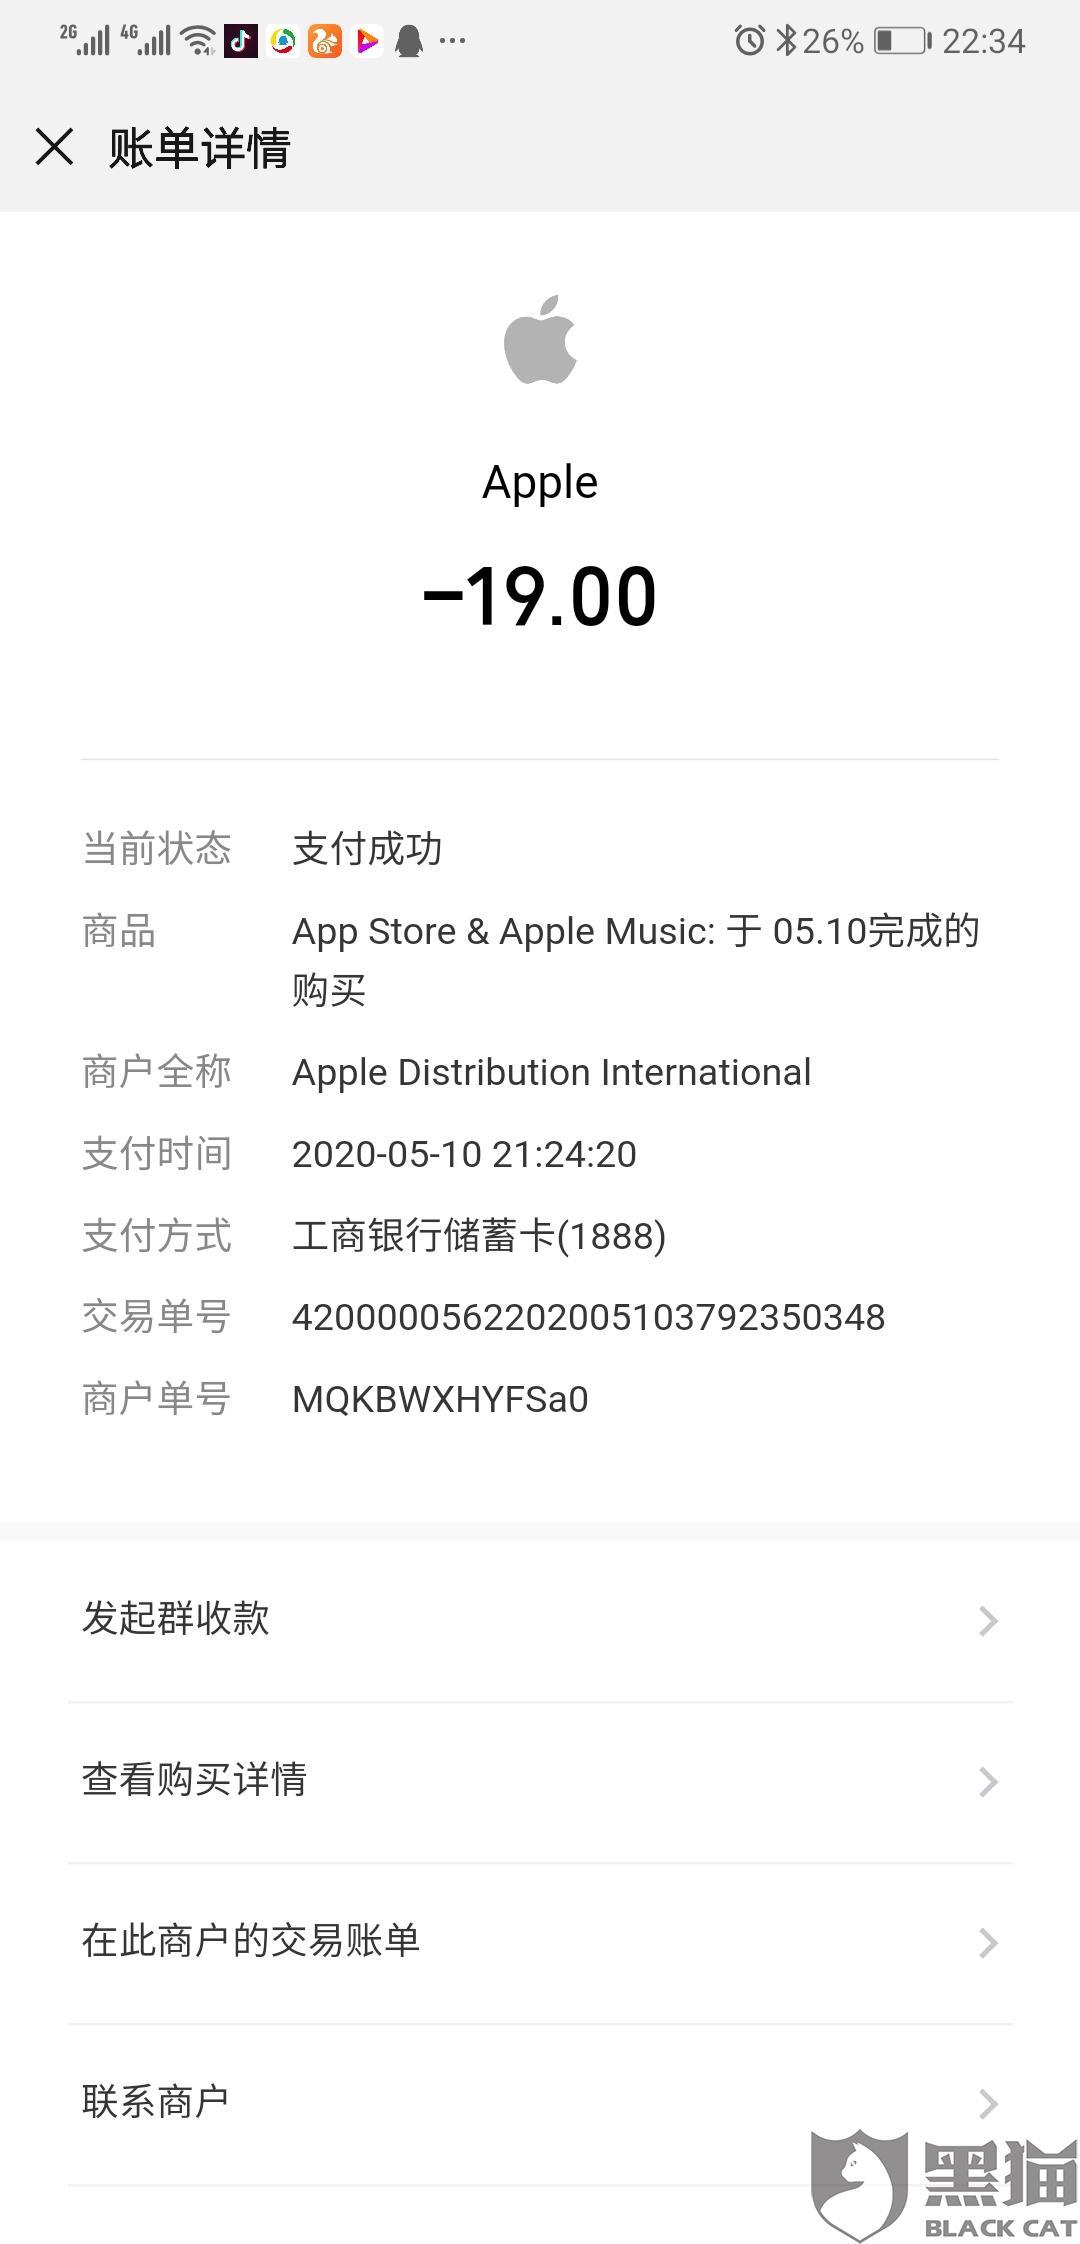 黑猫投诉:Apple Distribution International一直自动扣费